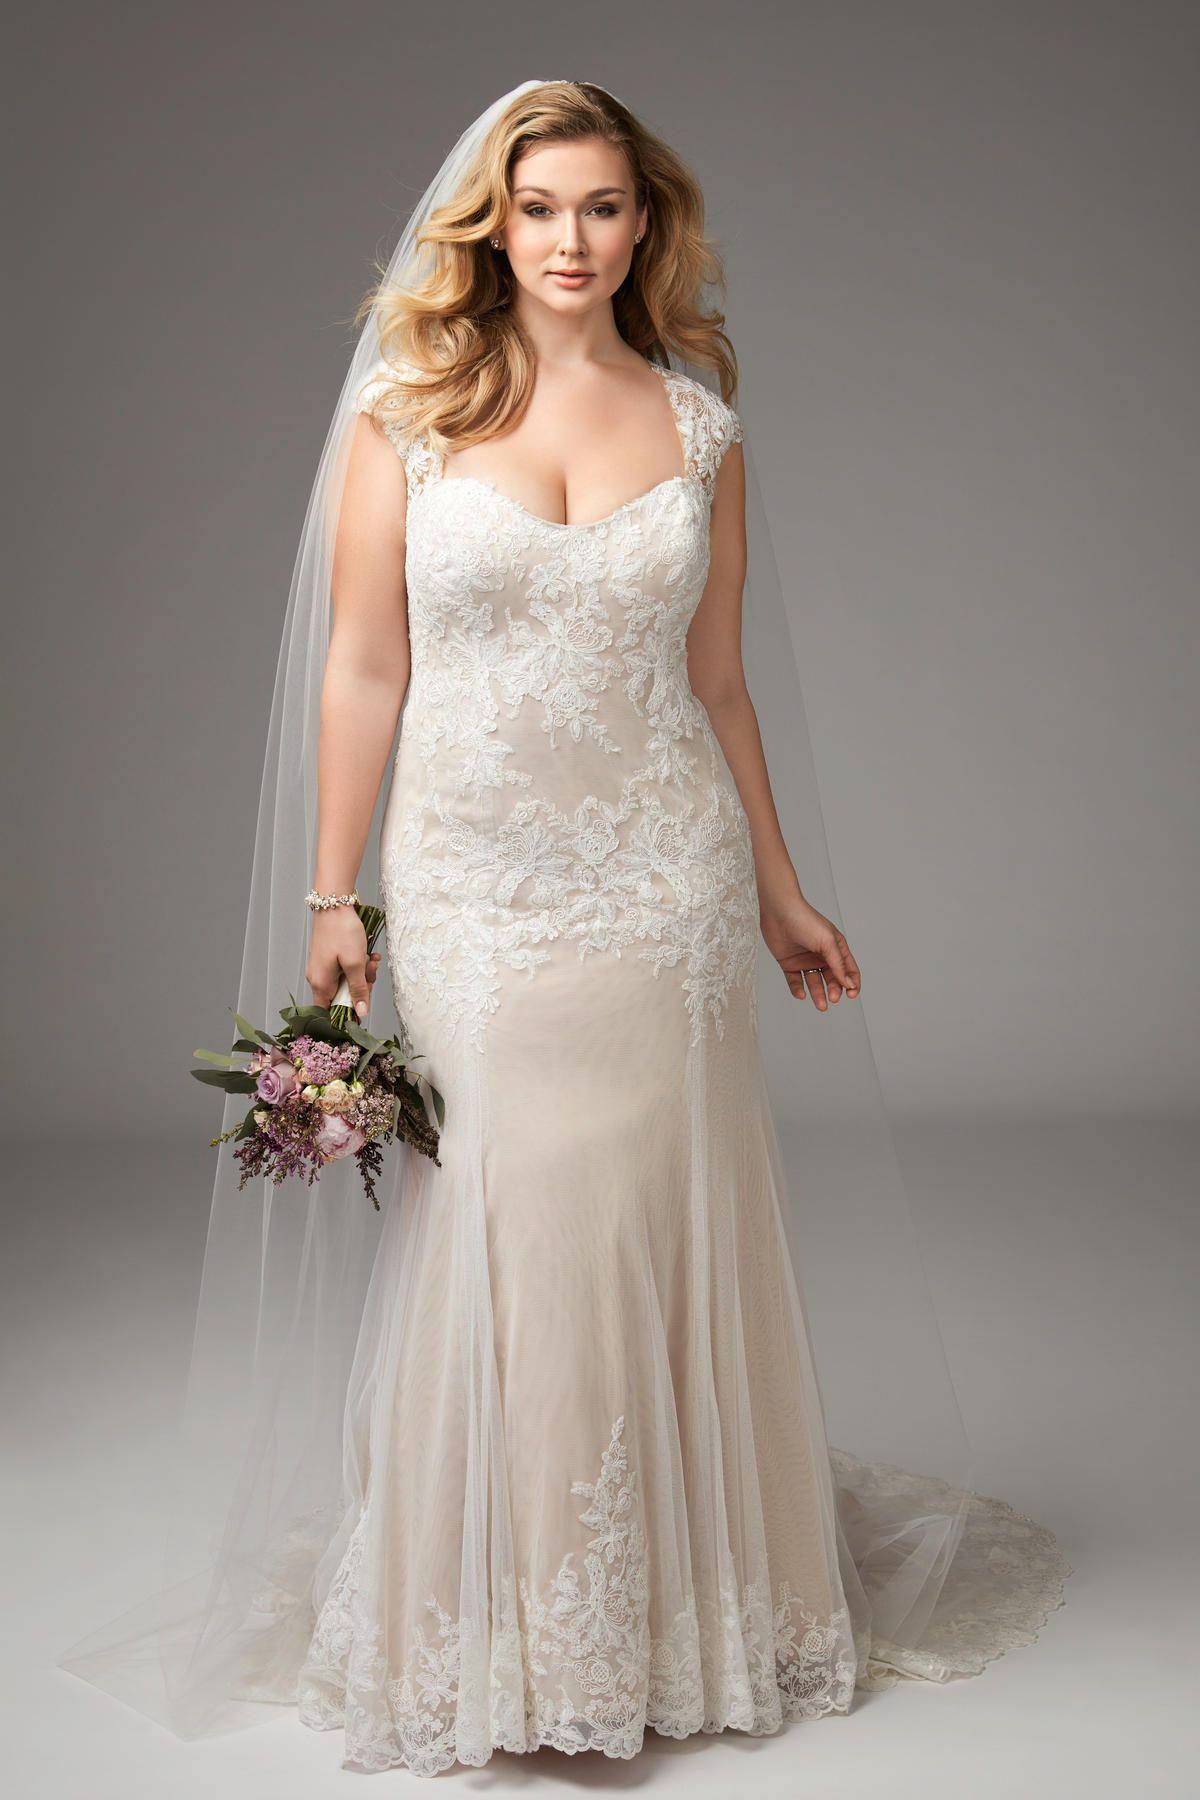 Wedding dresses for curvy brides  Julienne   Brides  Wtoo by Watters  locuras  Pinterest